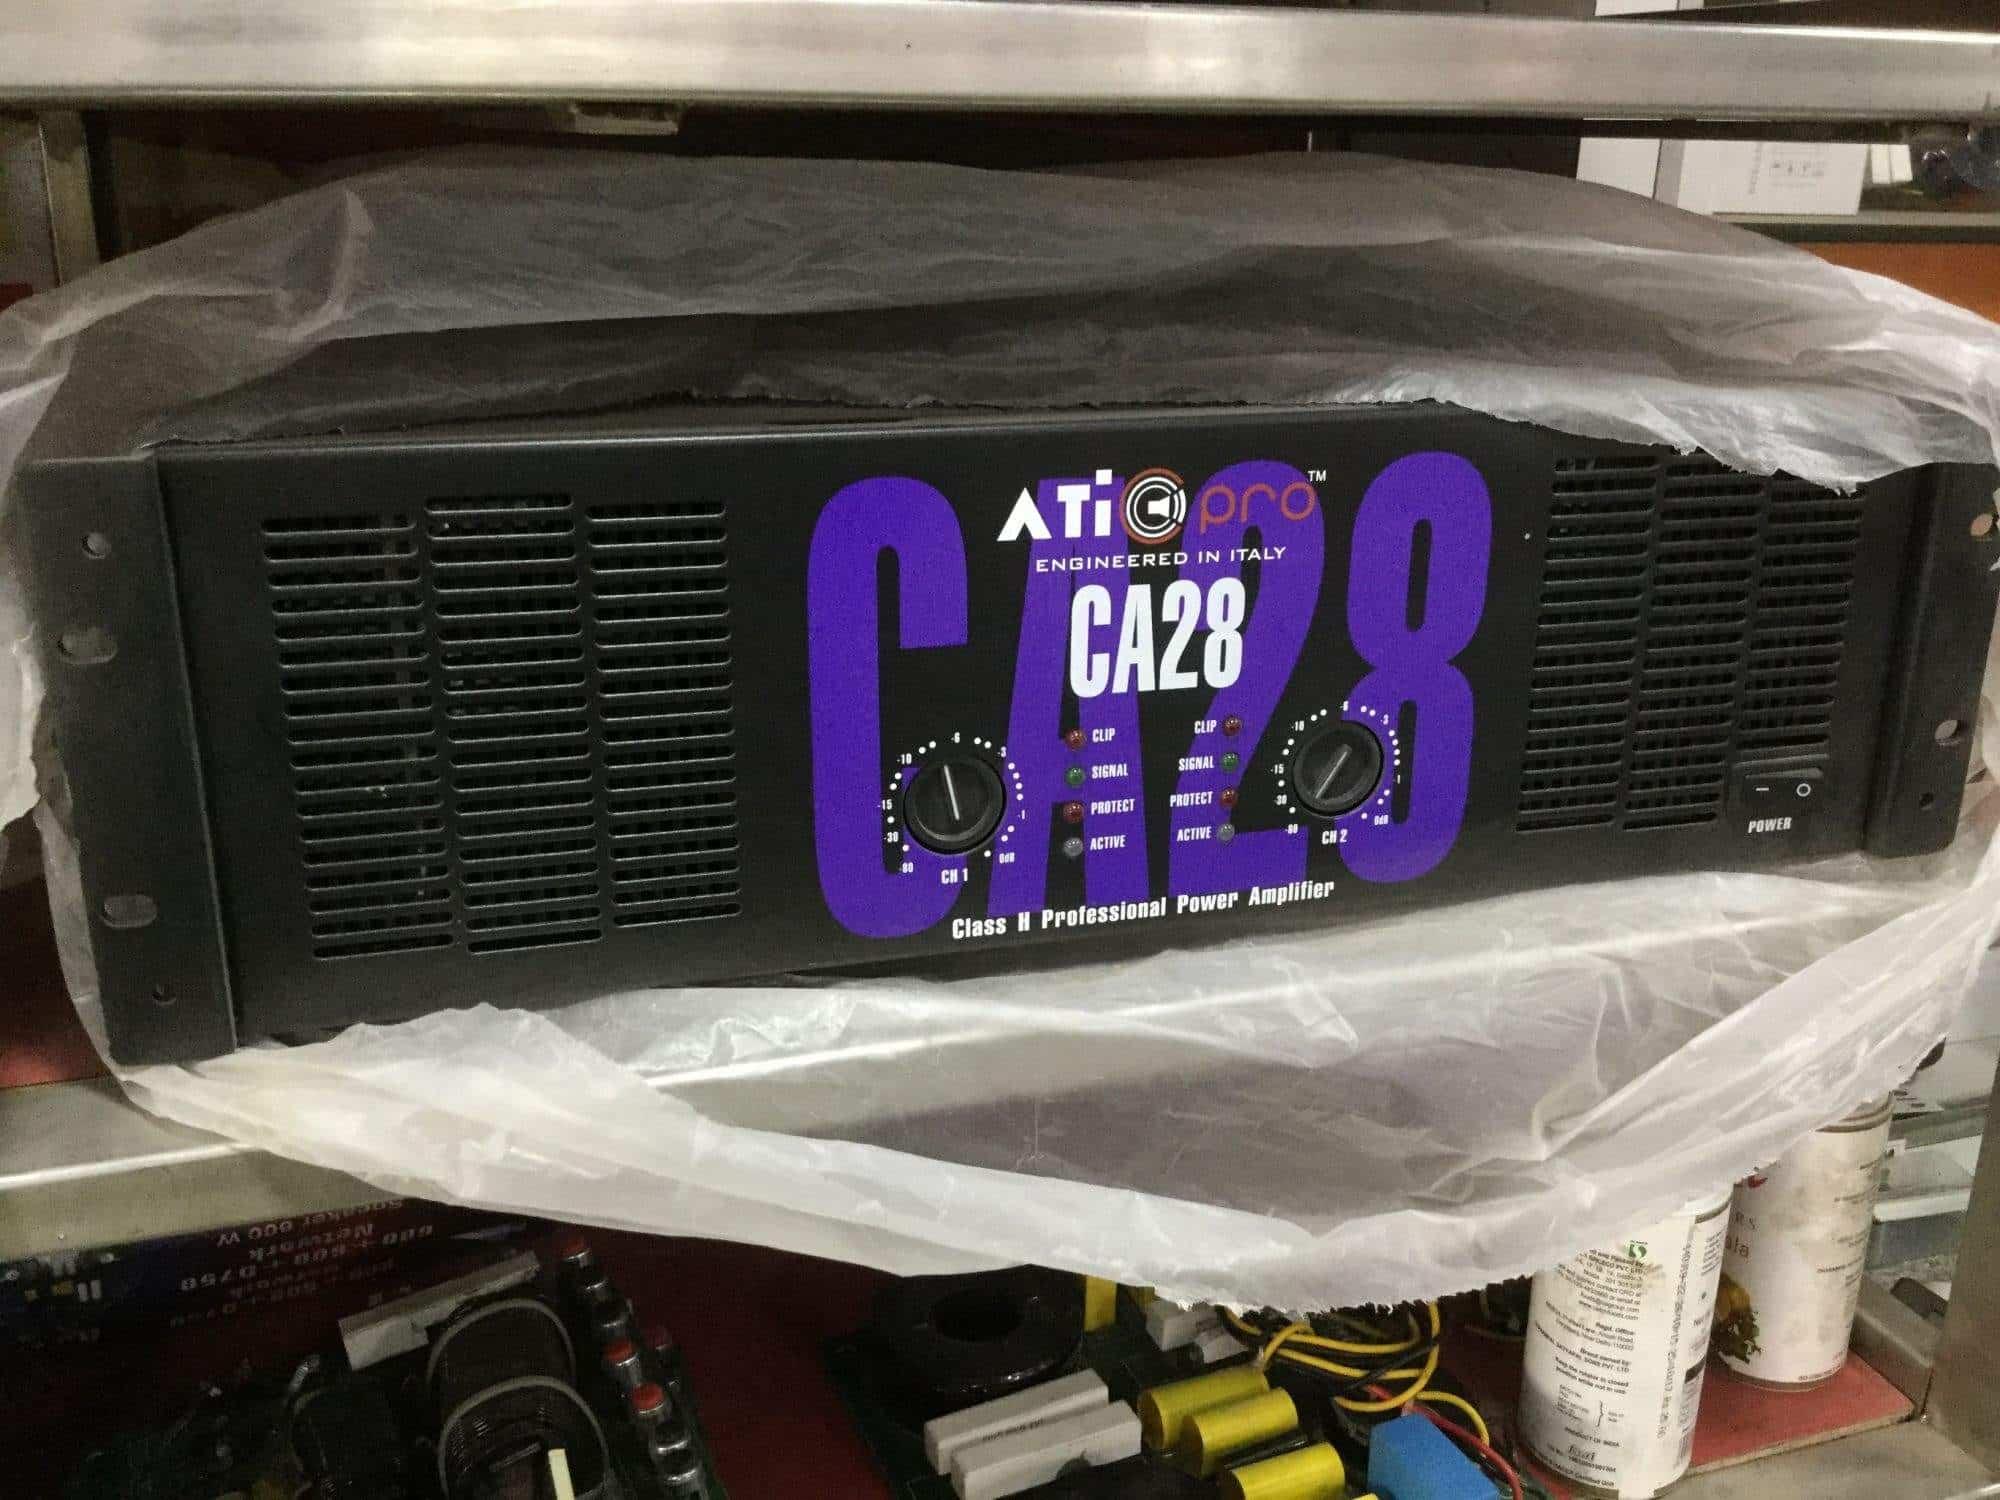 ATI PRO, Chandni Chowk - Imported Amplifier Dealers in Delhi